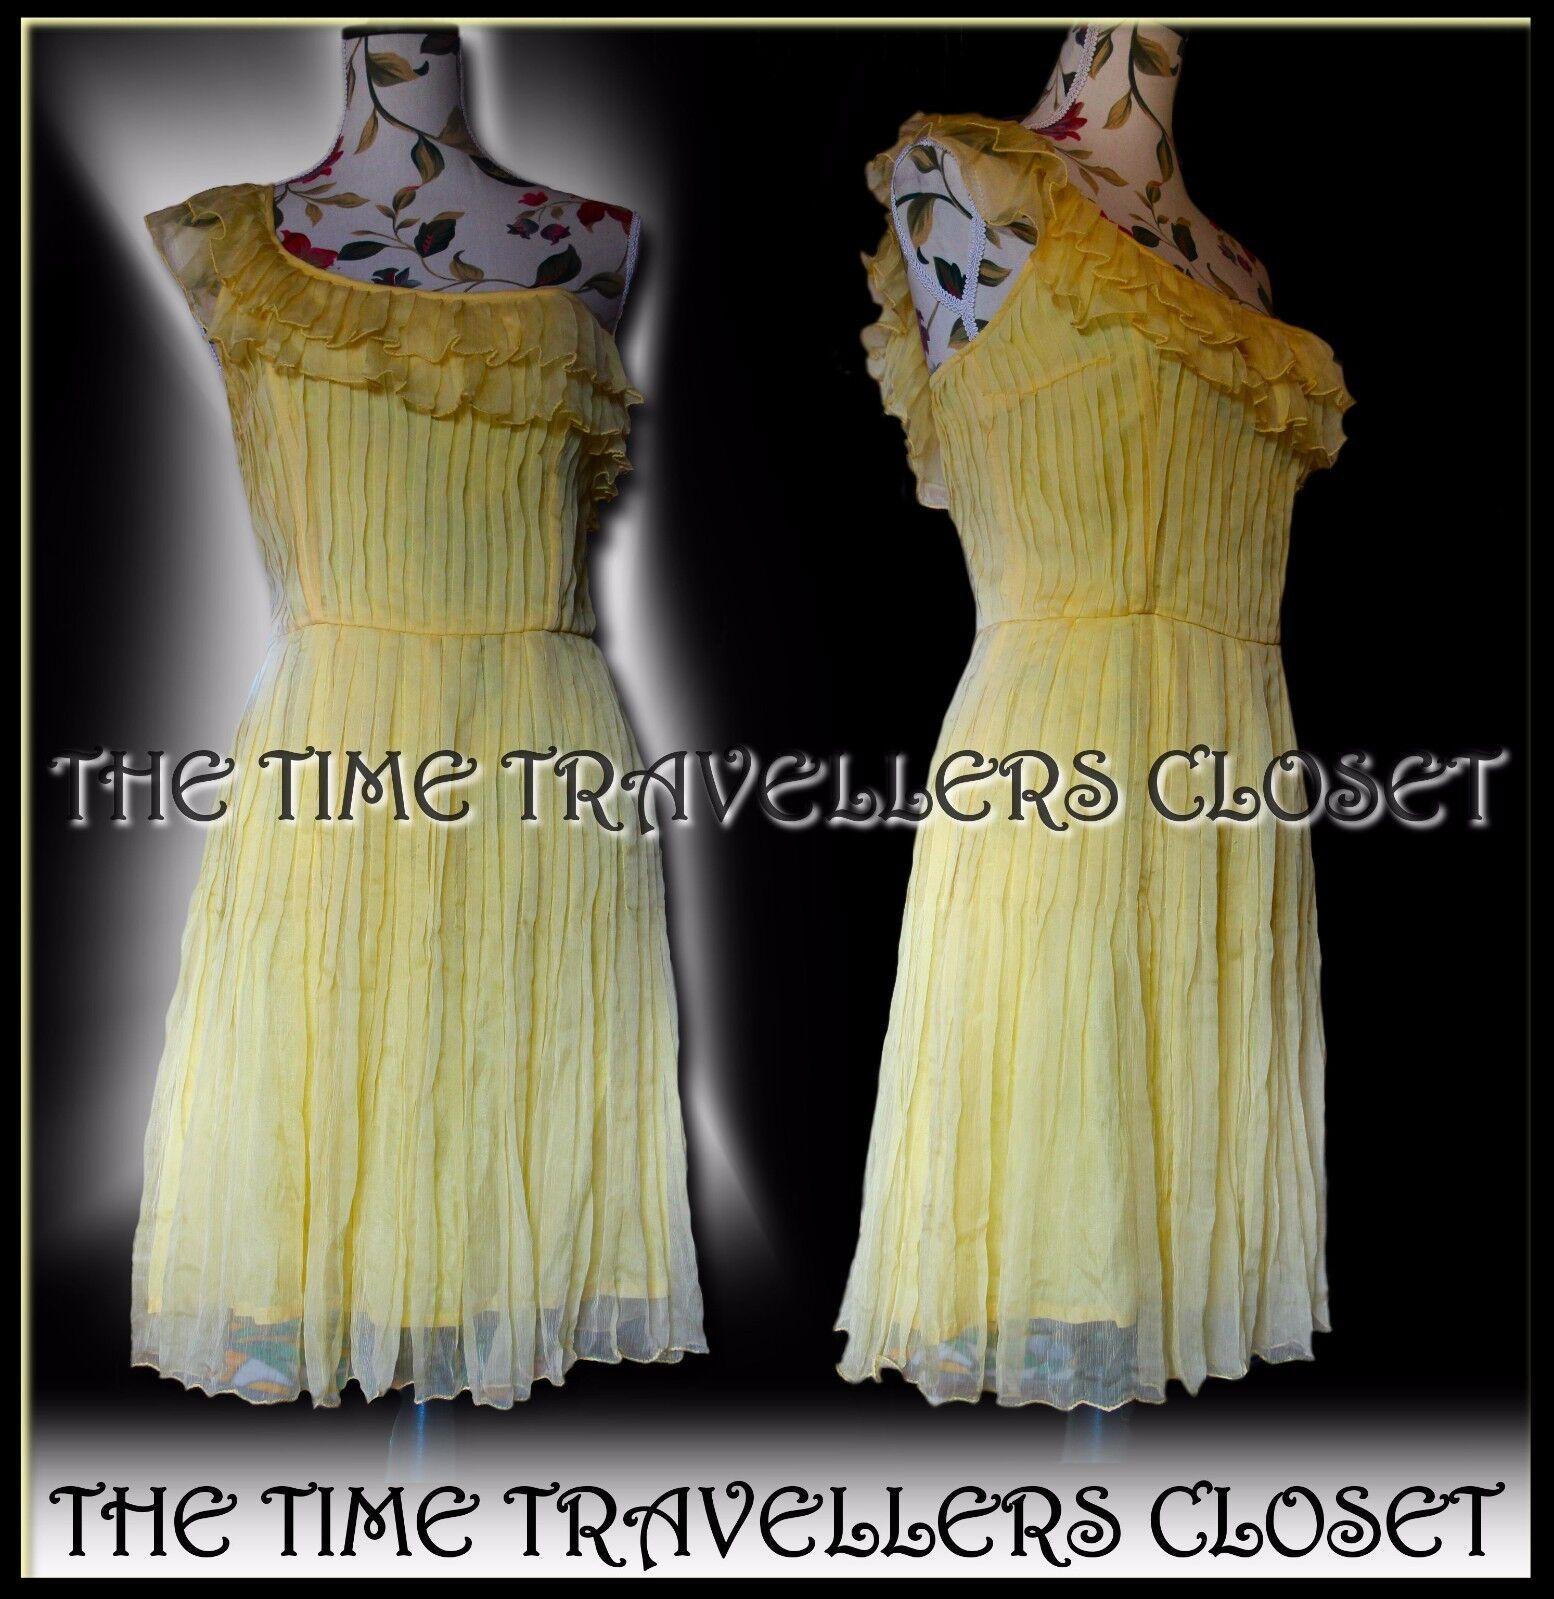 BNWT Kate Moss Topshop Rare Gelb Chiffon Grecian Inspirot Ruffle Dress UK10 12